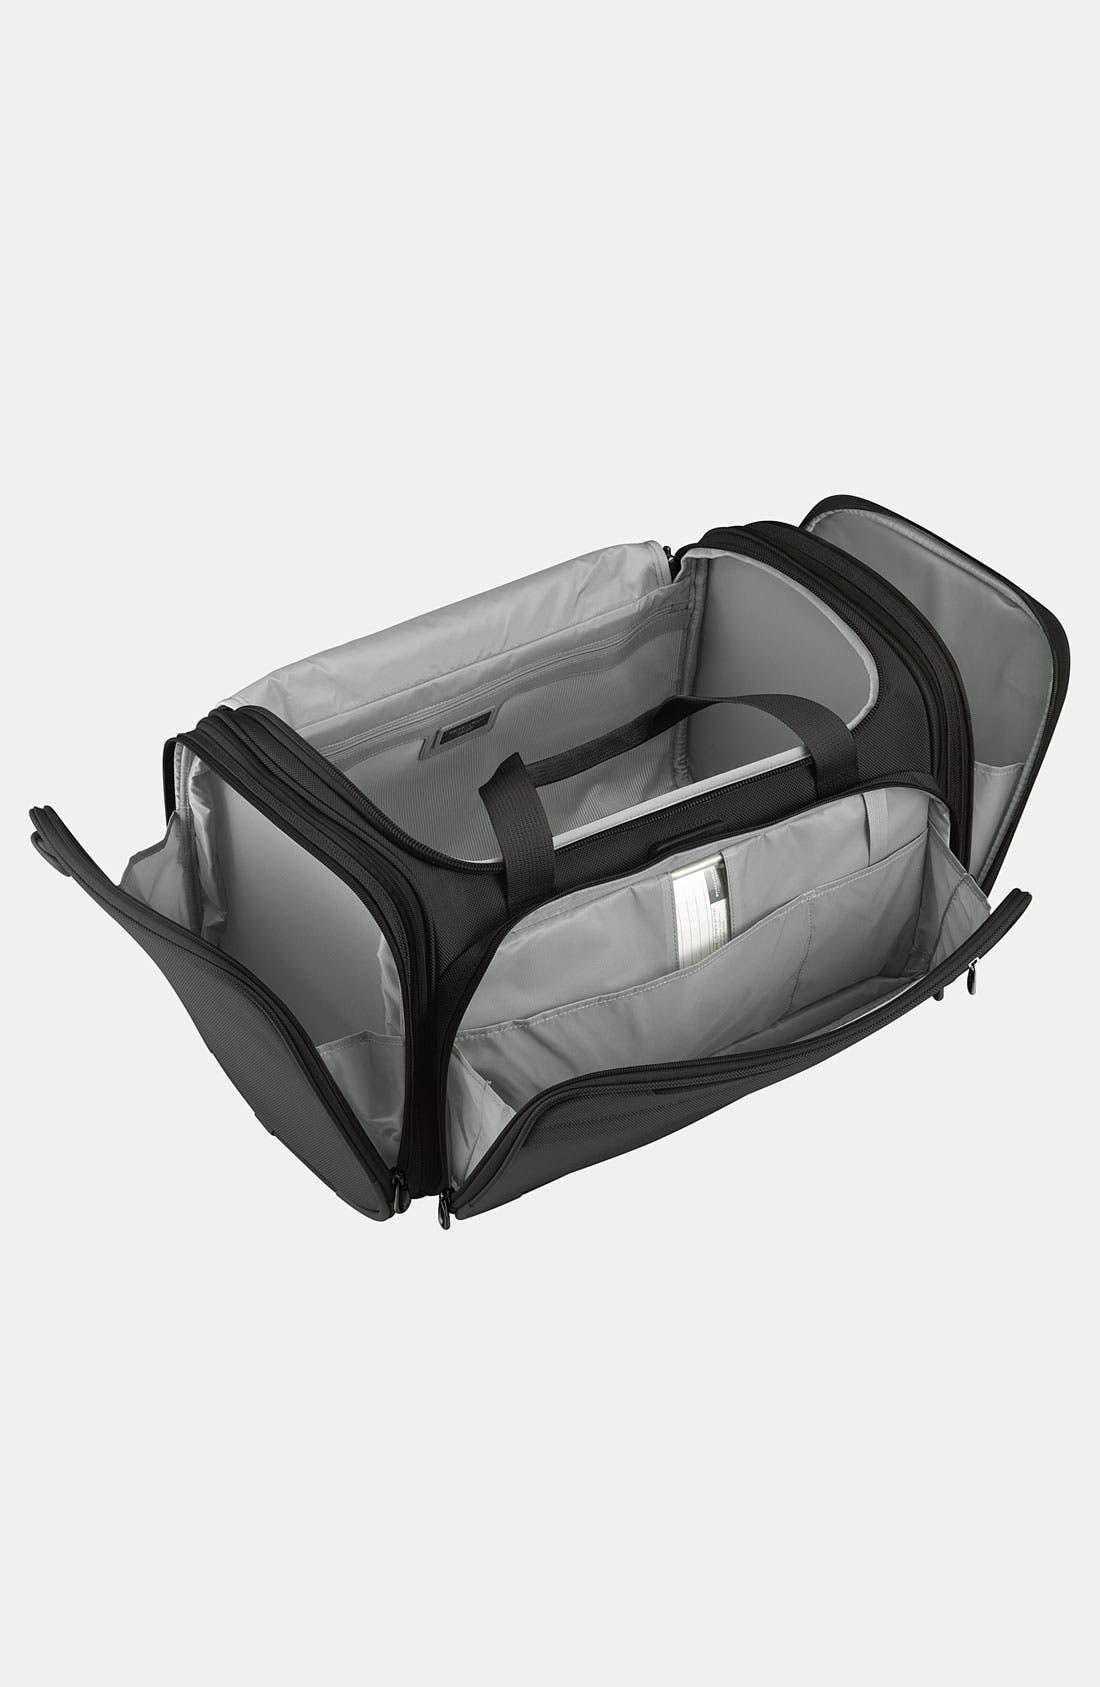 Alternate Image 2  - Briggs & Riley 'Baseline' Expandable Duffel Bag